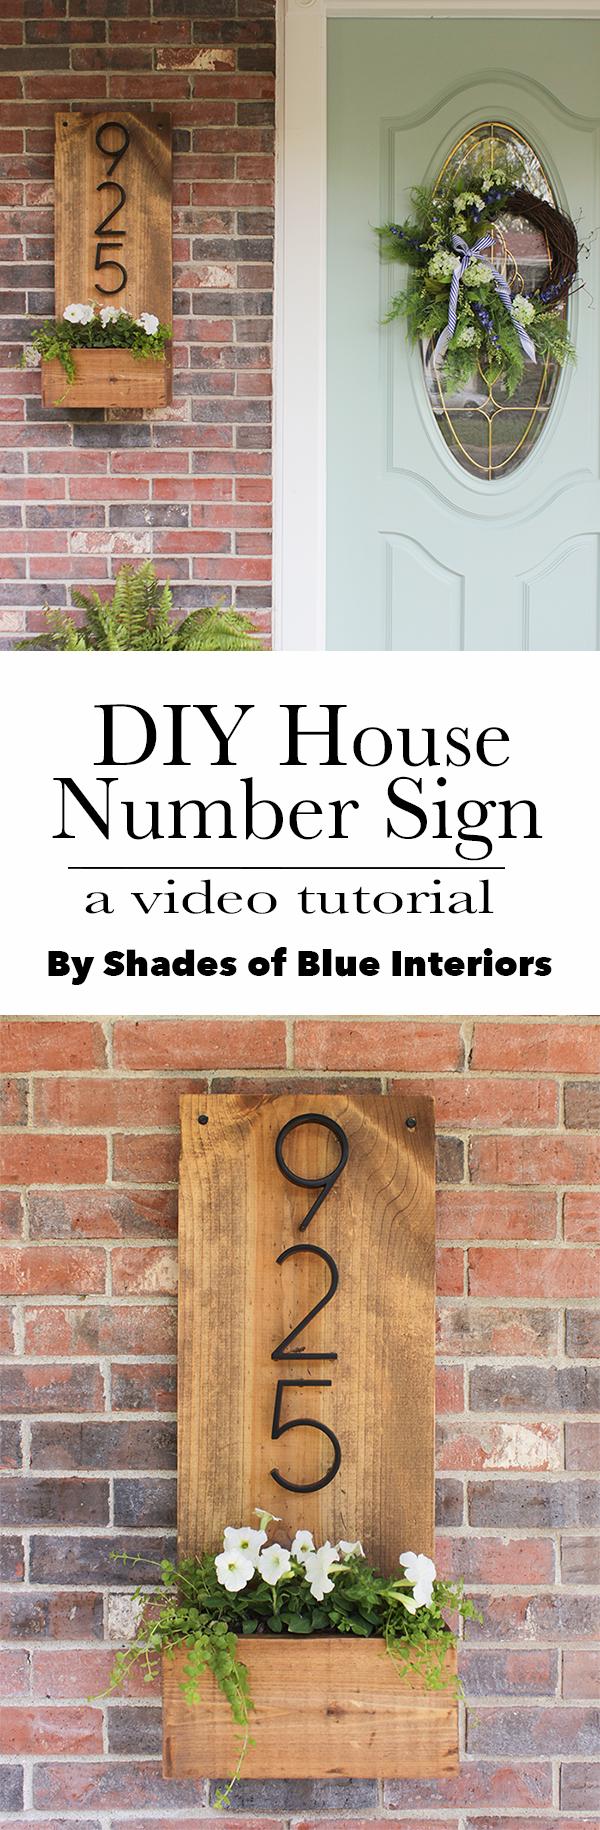 DIY-House-Number-Sign